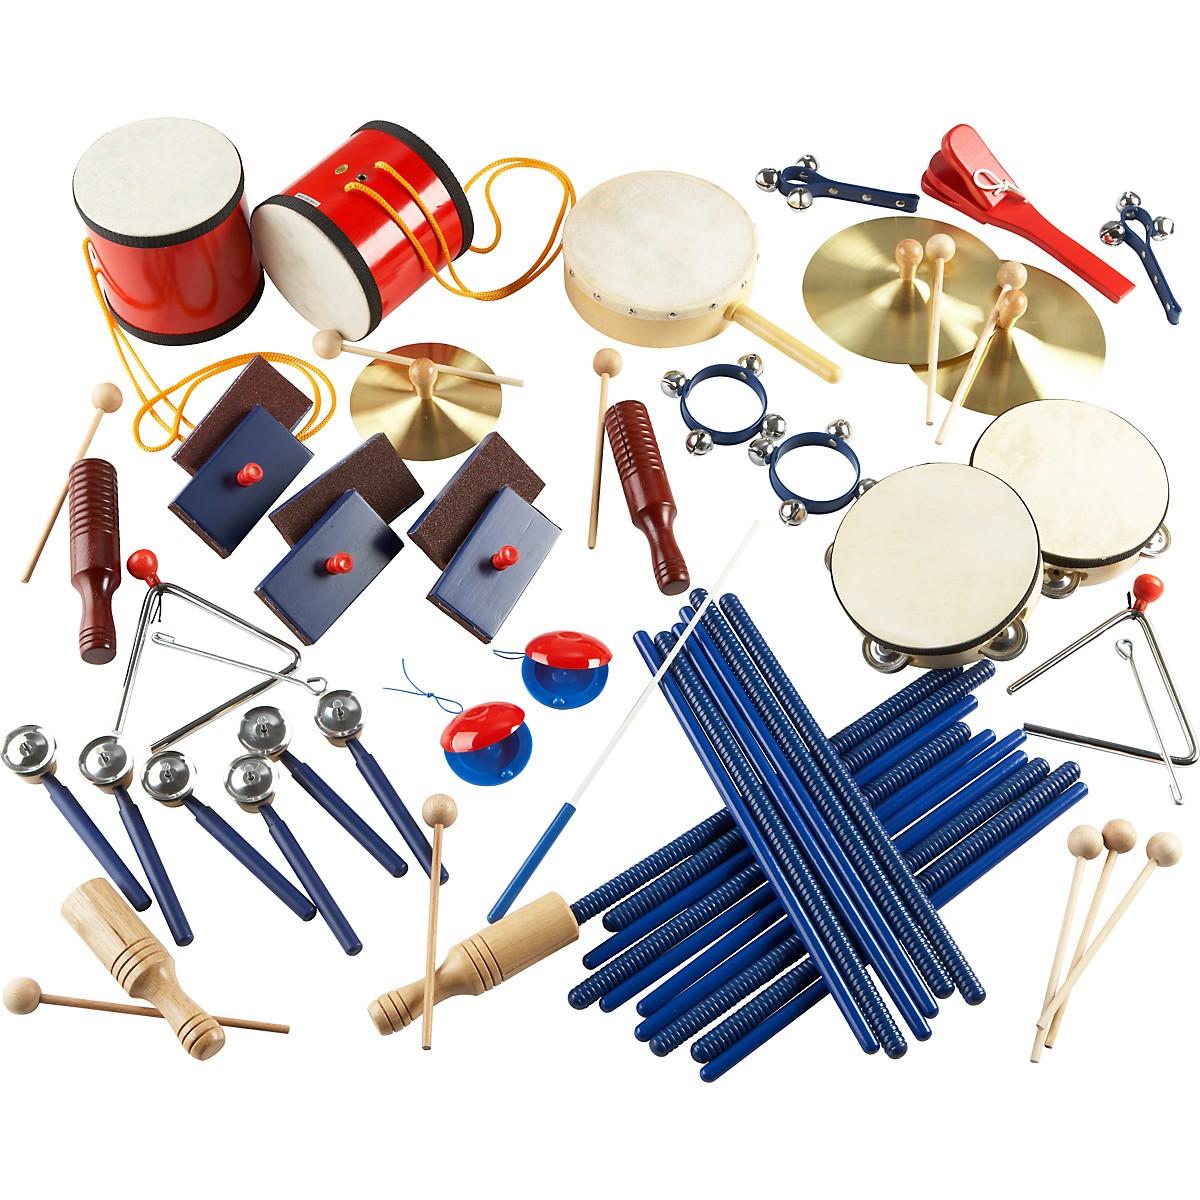 Lyons Rhythm Kit Packages